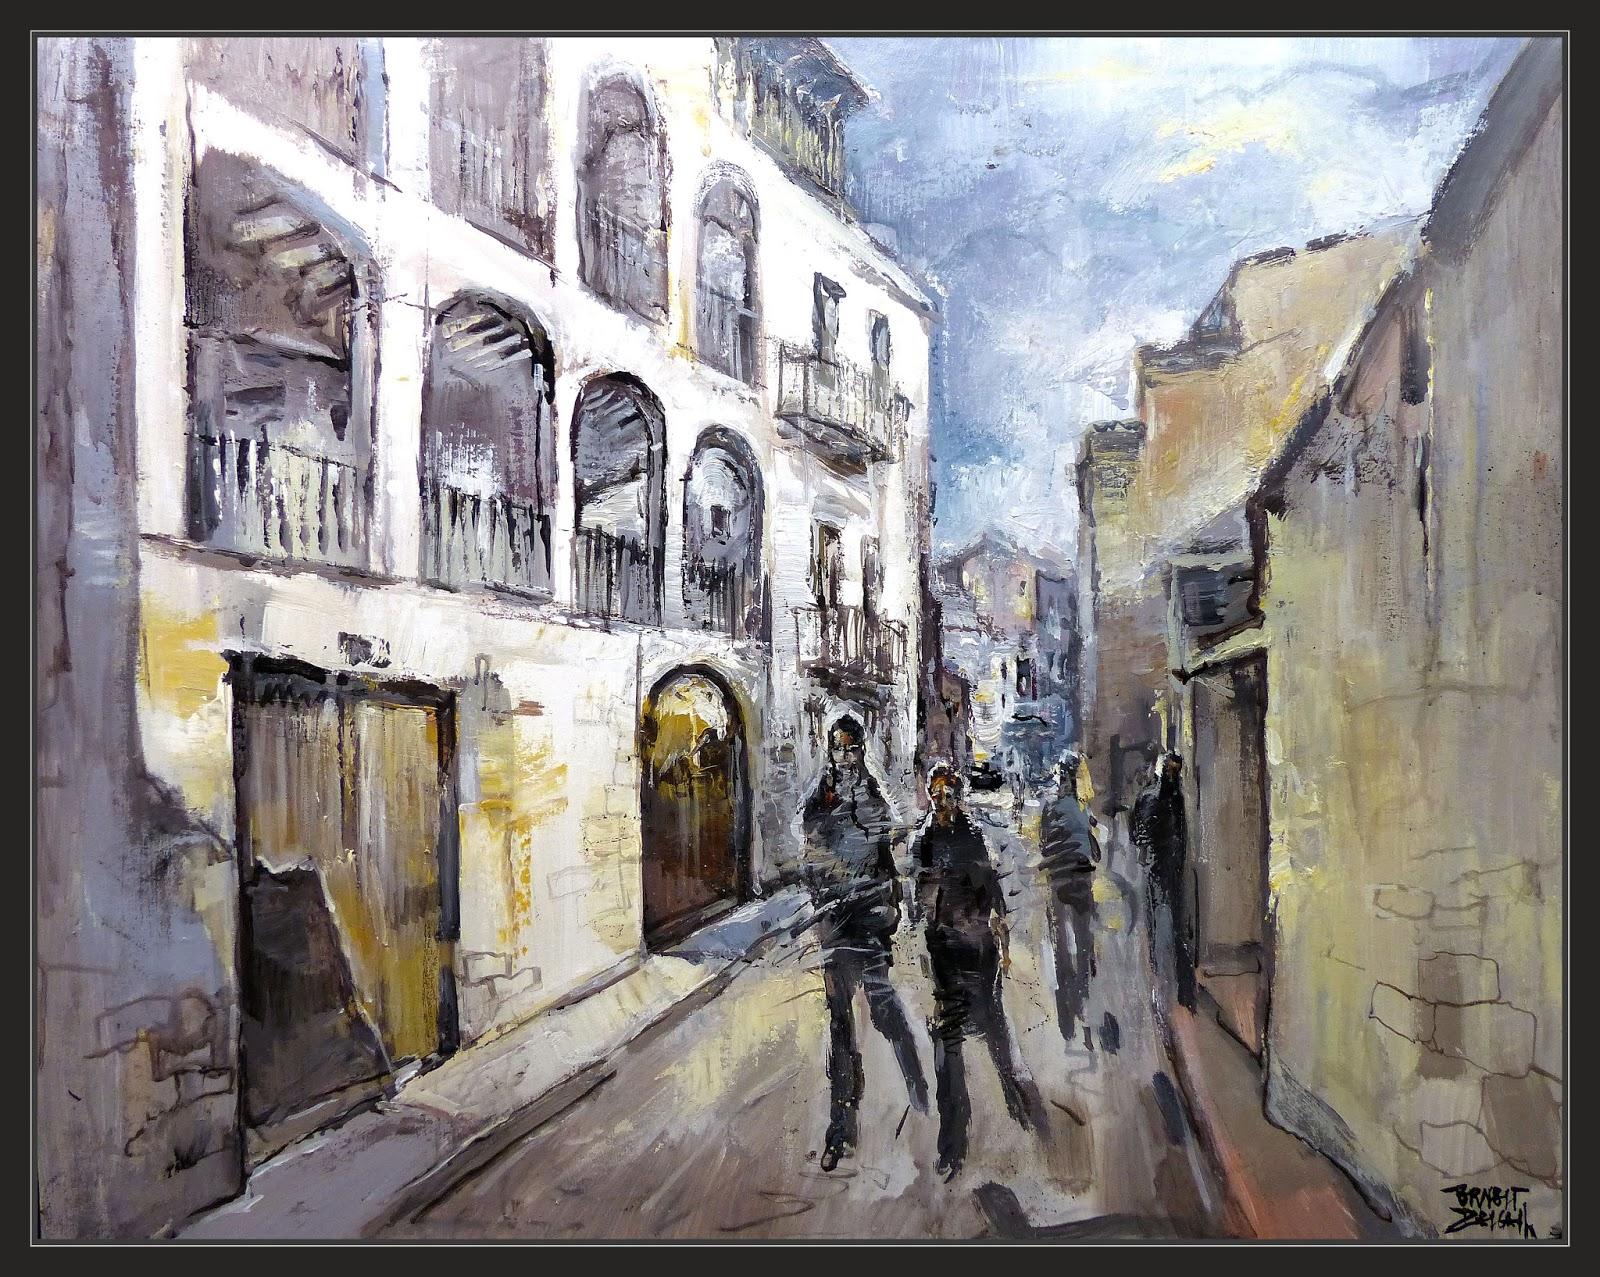 Ernest descals artista pintor - Pintur sant fruitos ...